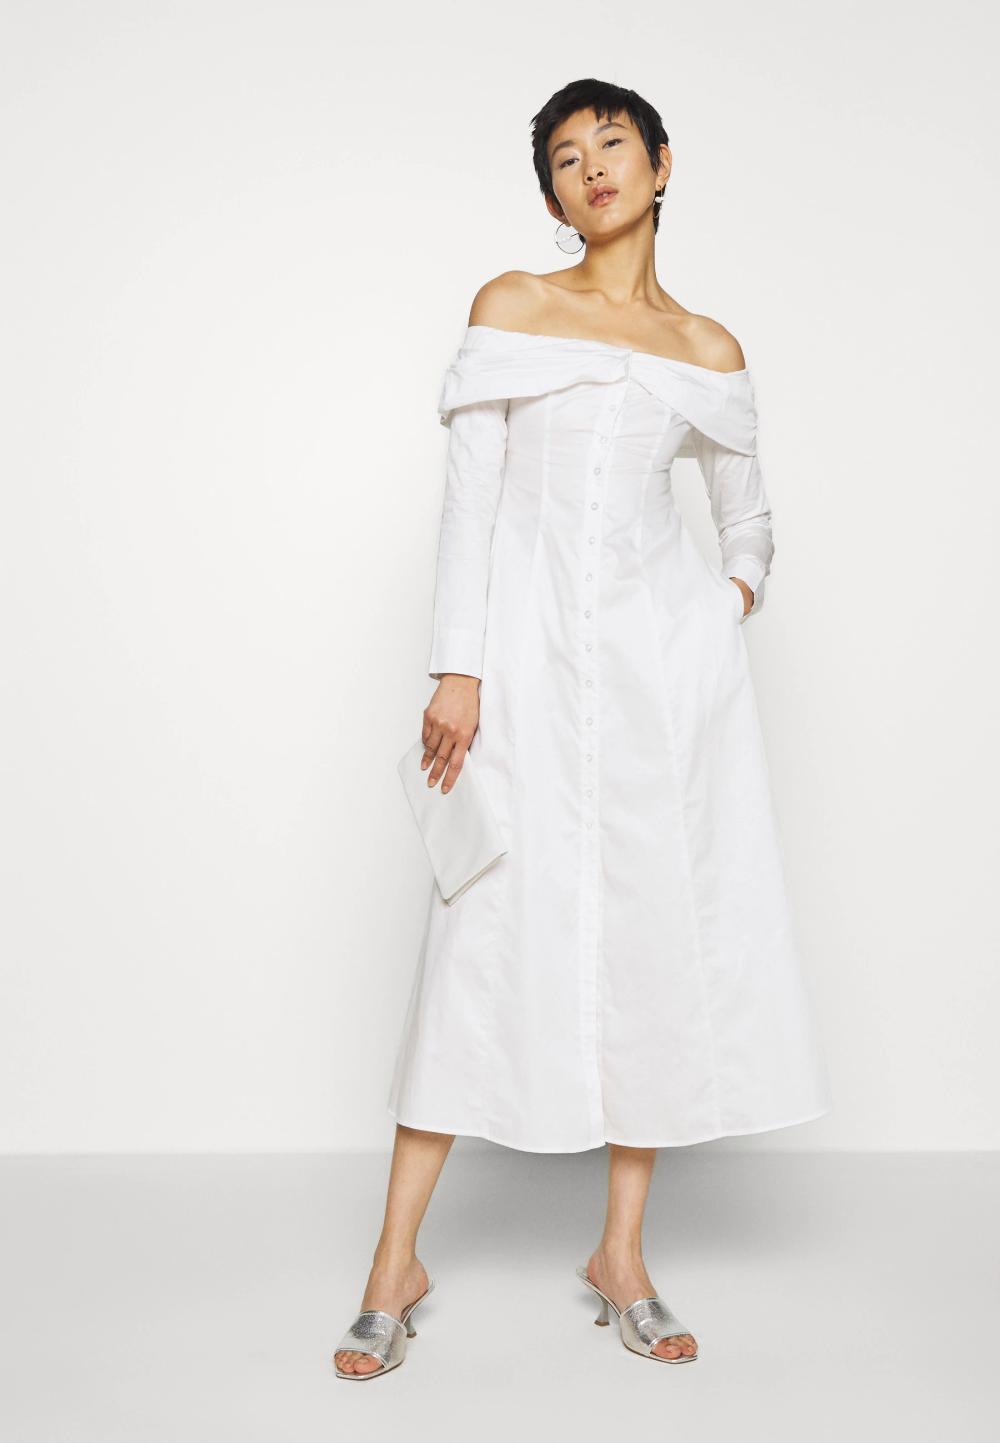 The Off The Shoulder Dress Shirt Dress White Zalando Co Uk In 2020 White Shirt Dress Dresses Shoulder Dress